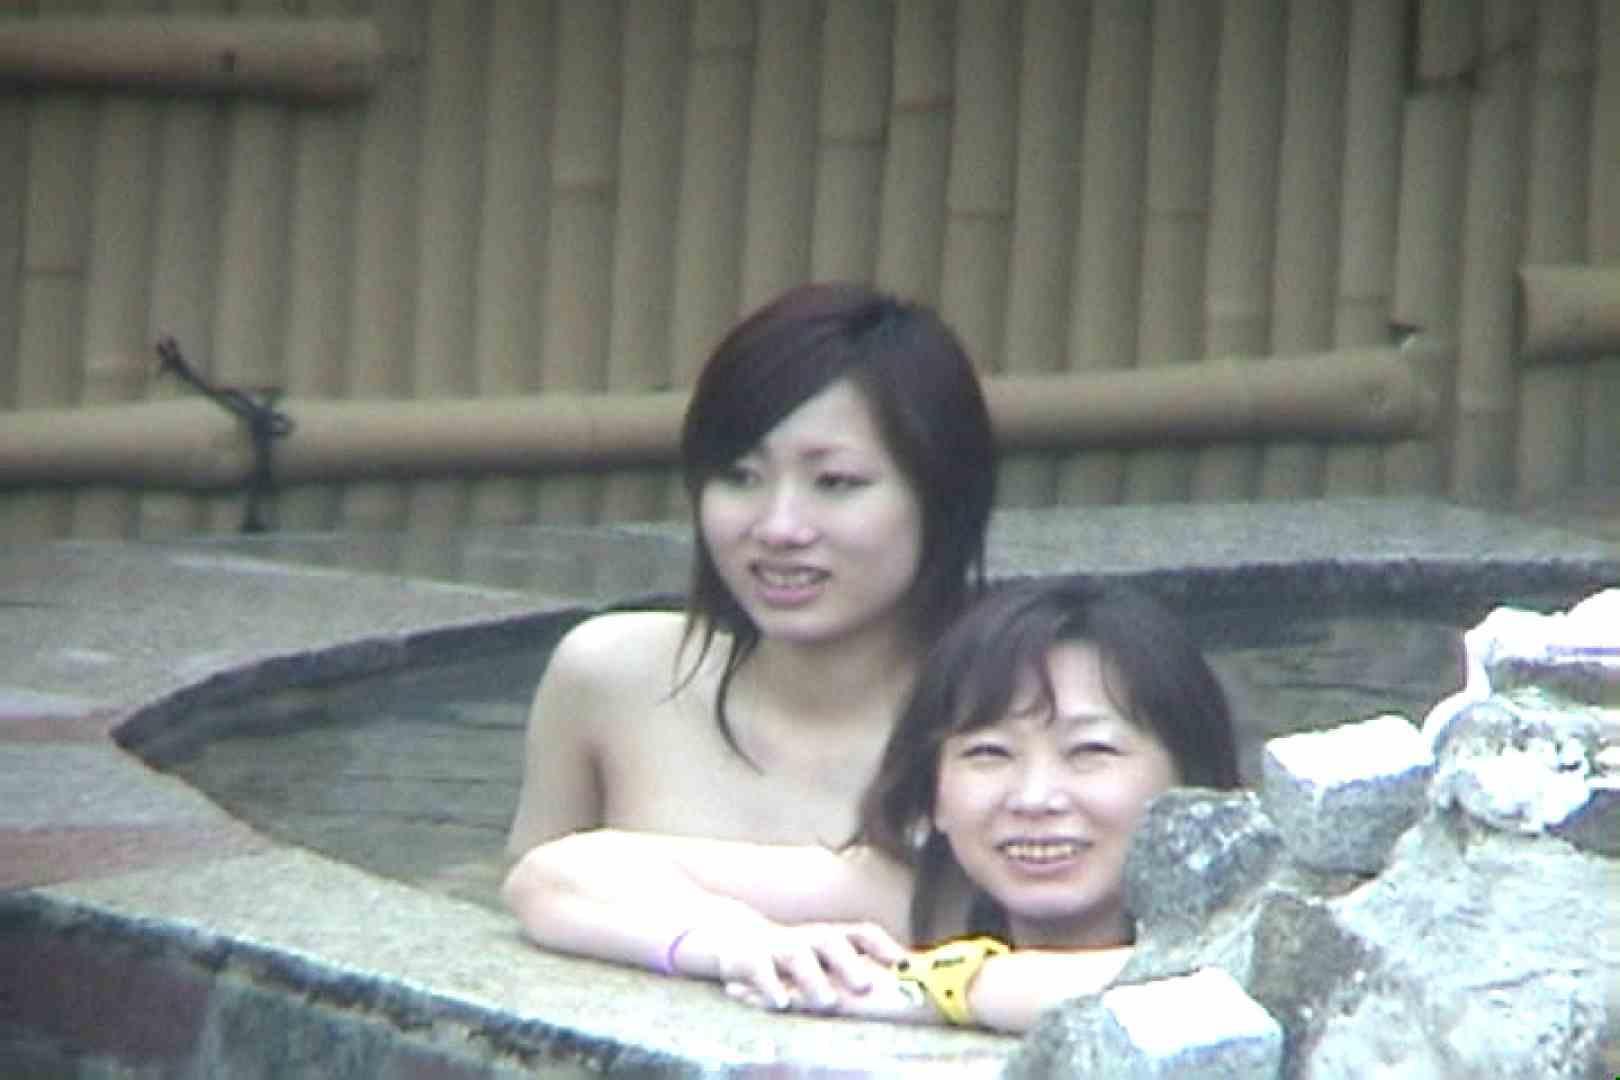 Aquaな露天風呂Vol.58【VIP限定】 HなOL | 0  95pic 37